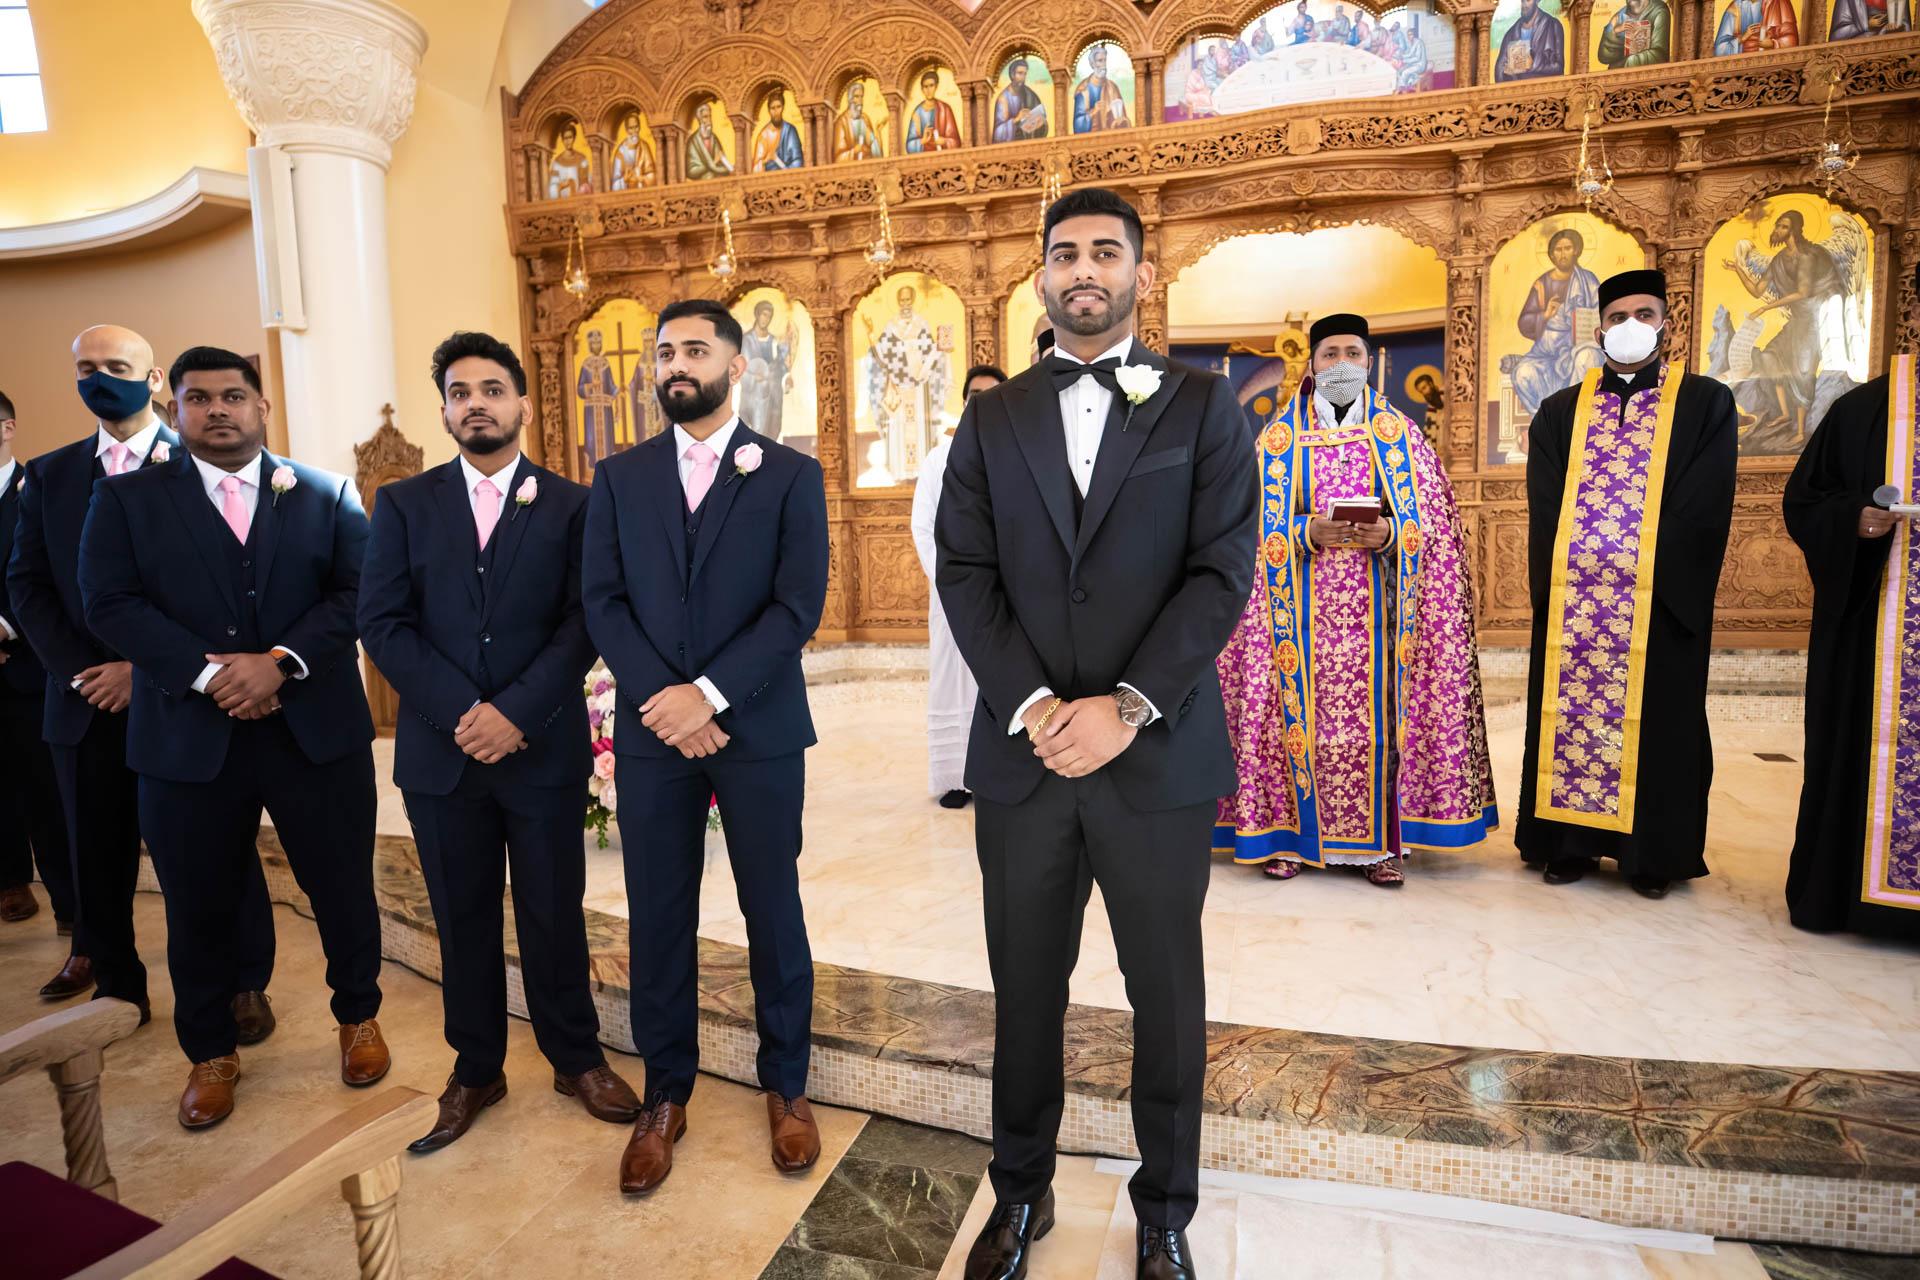 WESTMOUNT COUNTRY CLUB INDIAN WEDDING 7